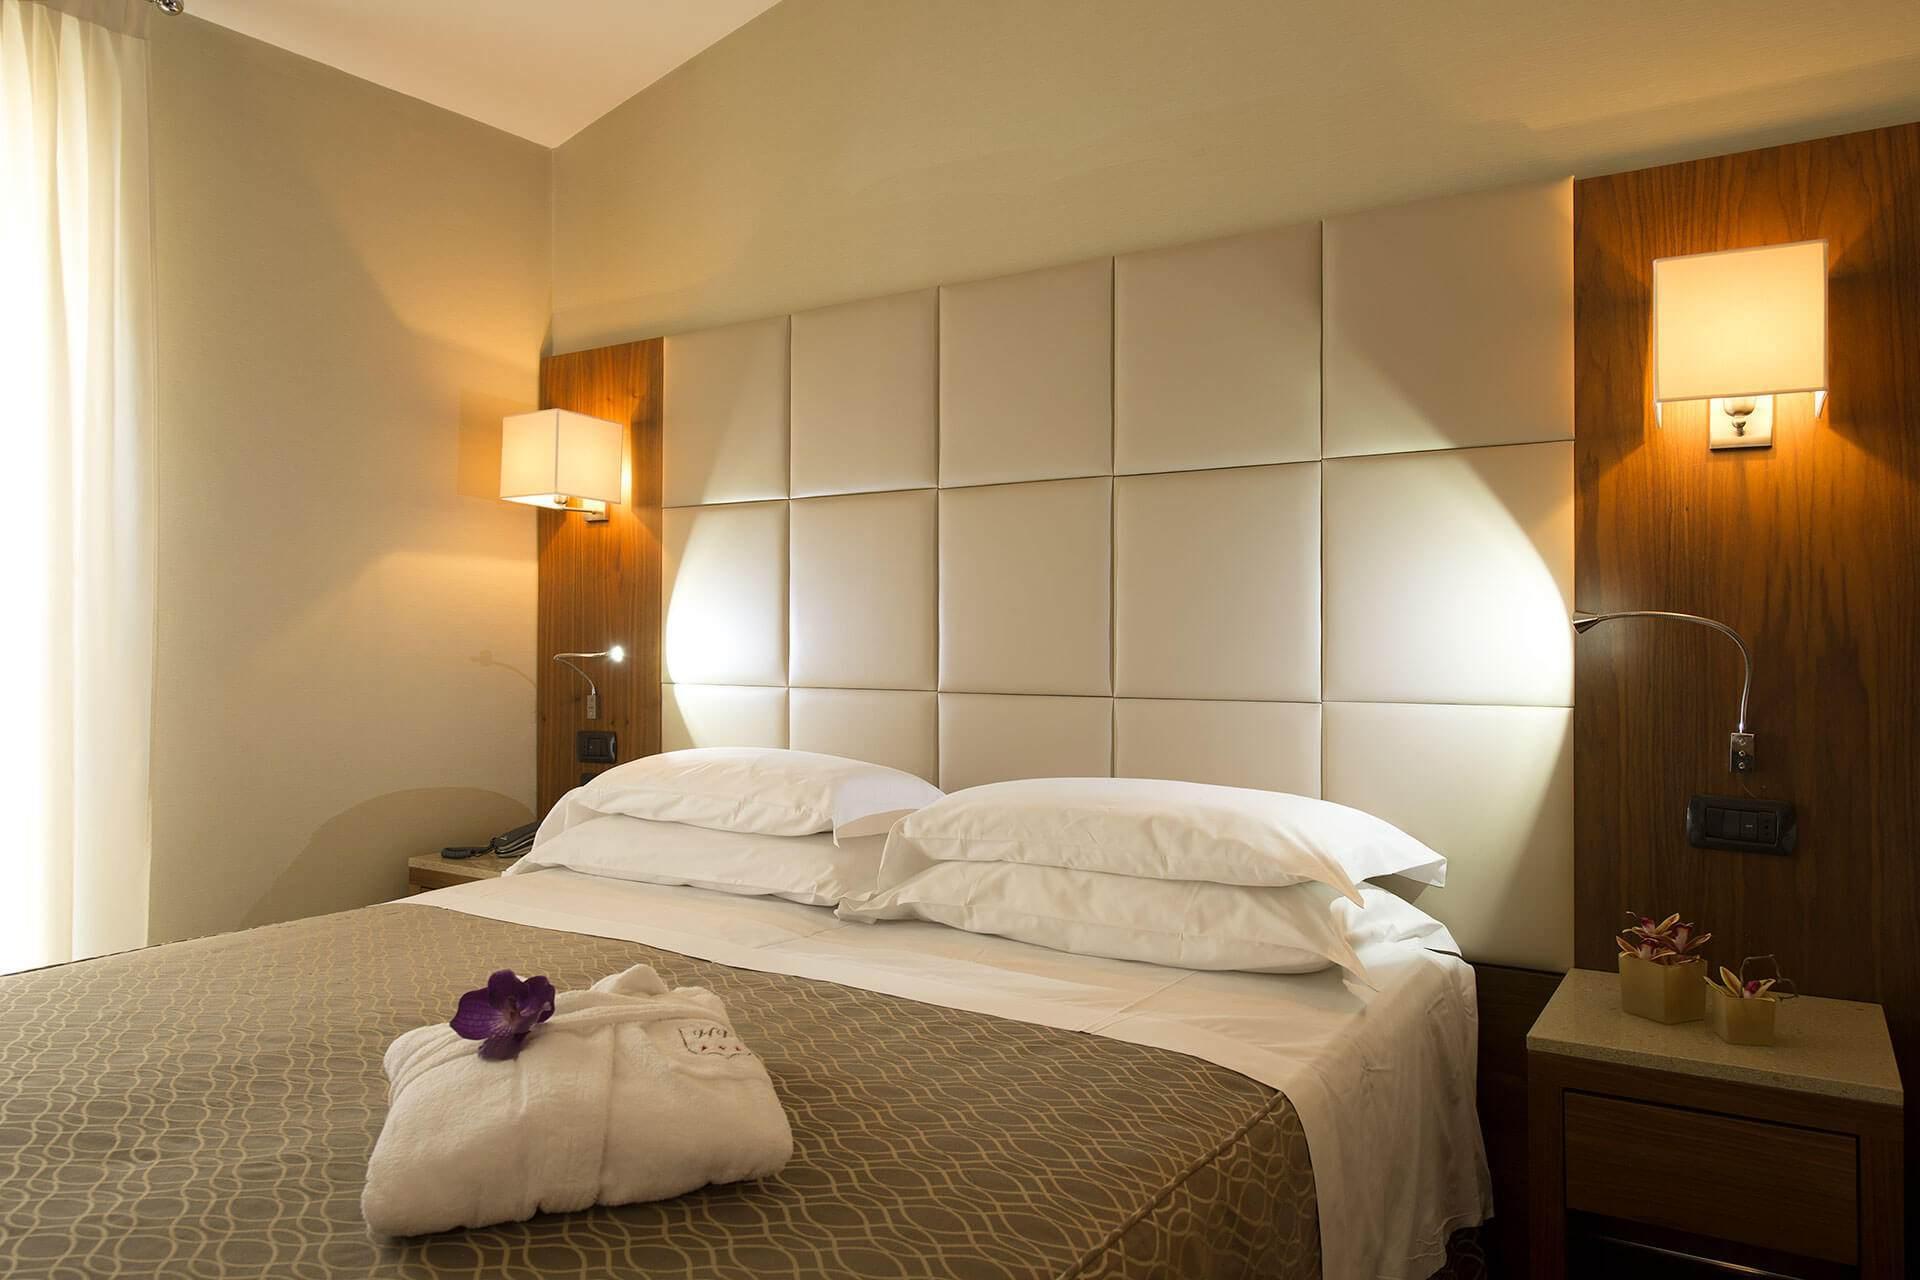 Camere hotel fenice milano for Hotel fenice milano